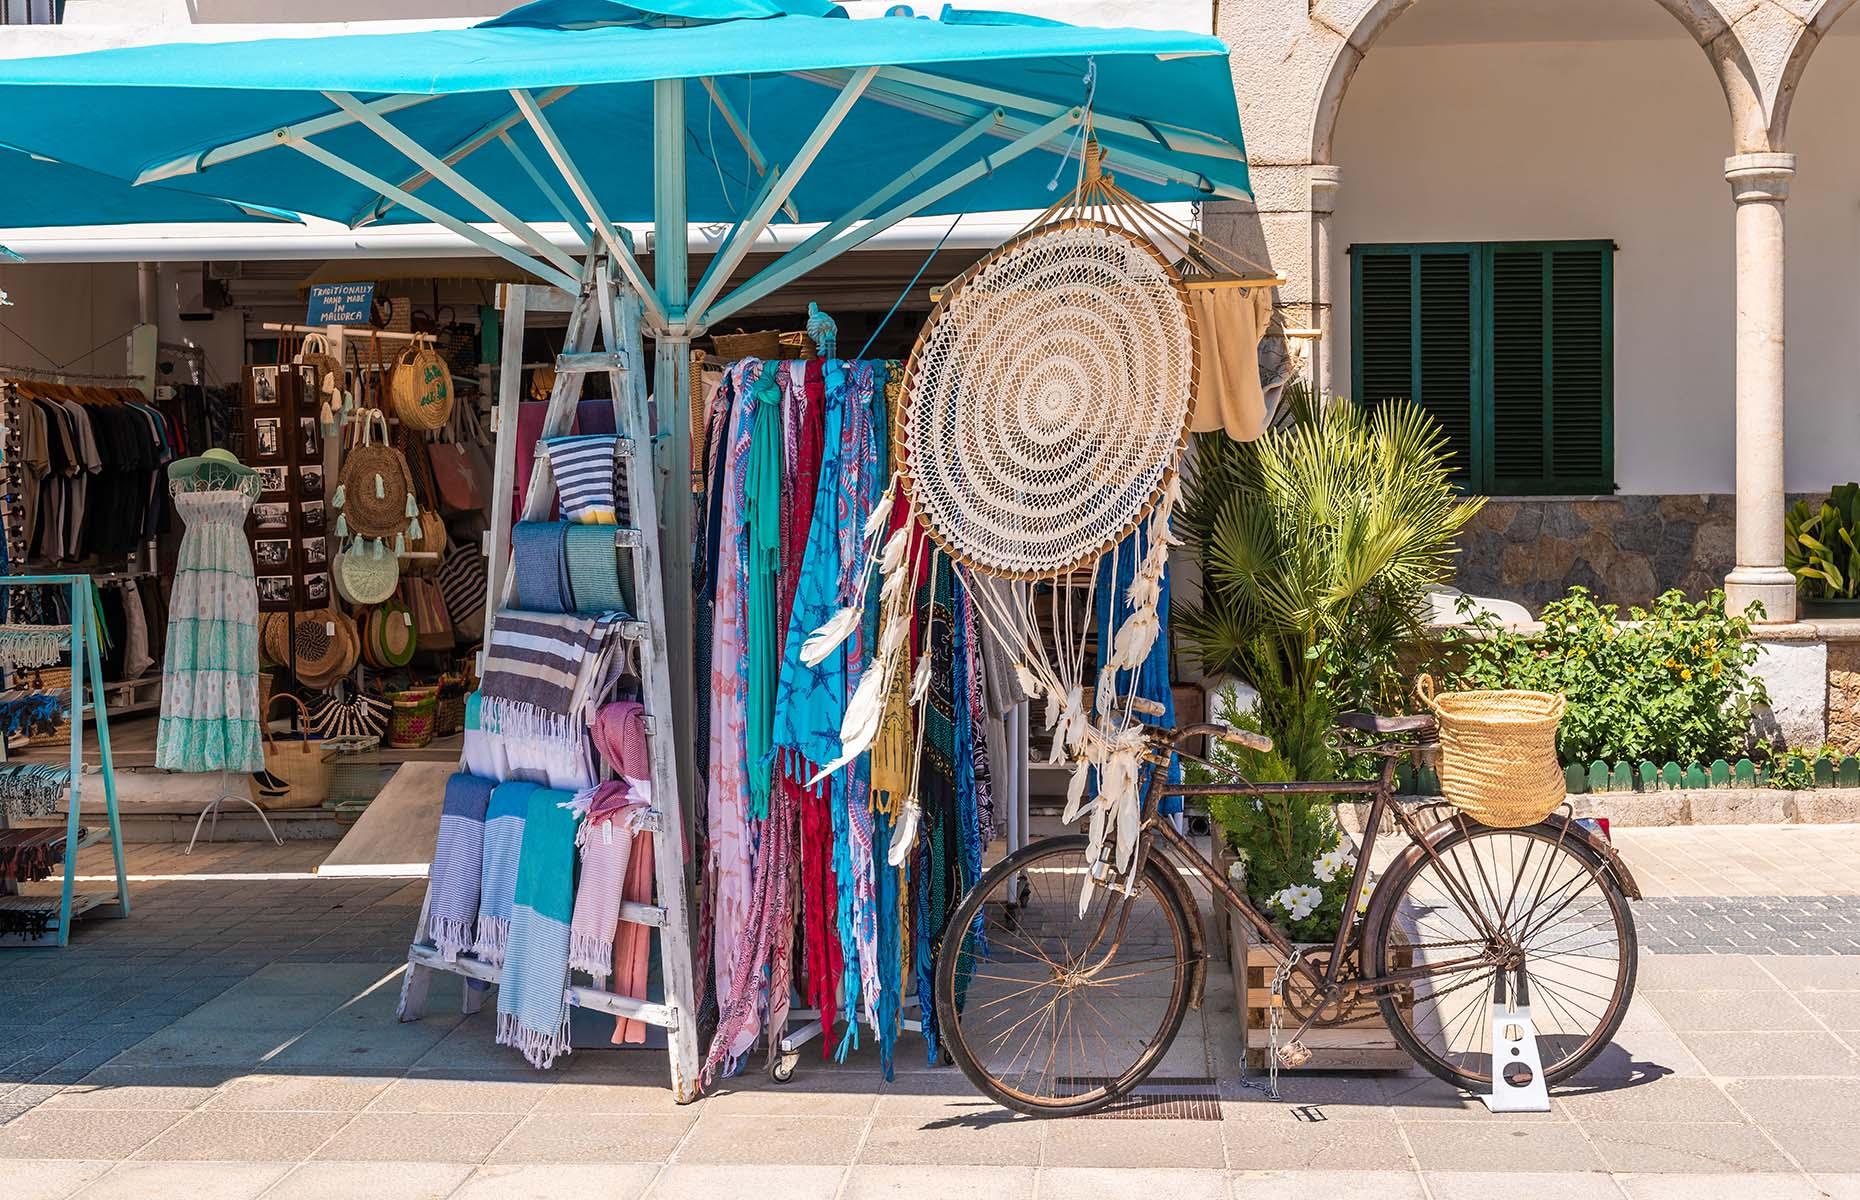 Sunday market in Pollenca, Mallorca (Image: vivoo/Shutterstock)